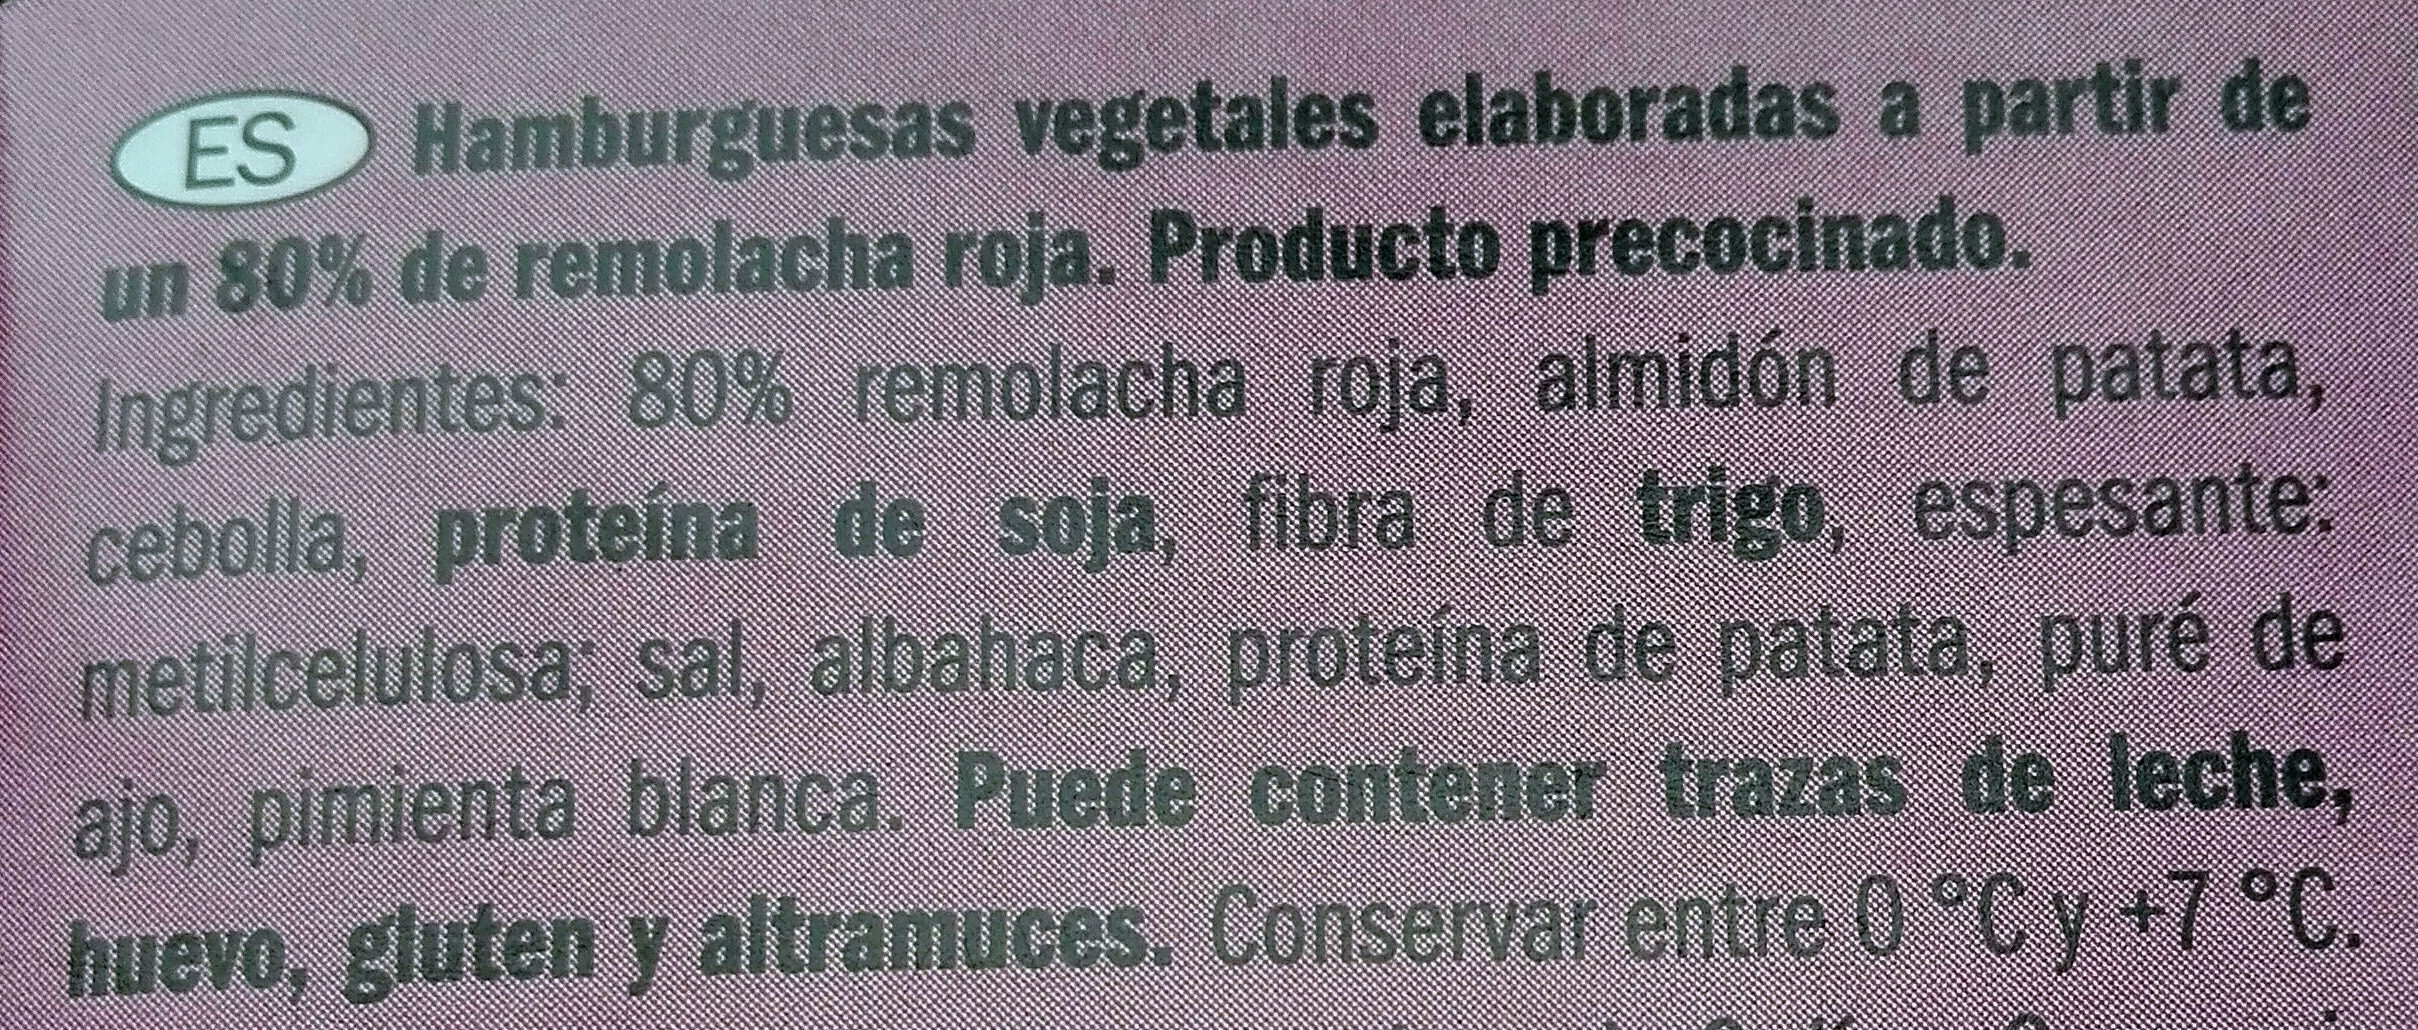 Hamburguesas Veganas de remolacha - Ingrédients